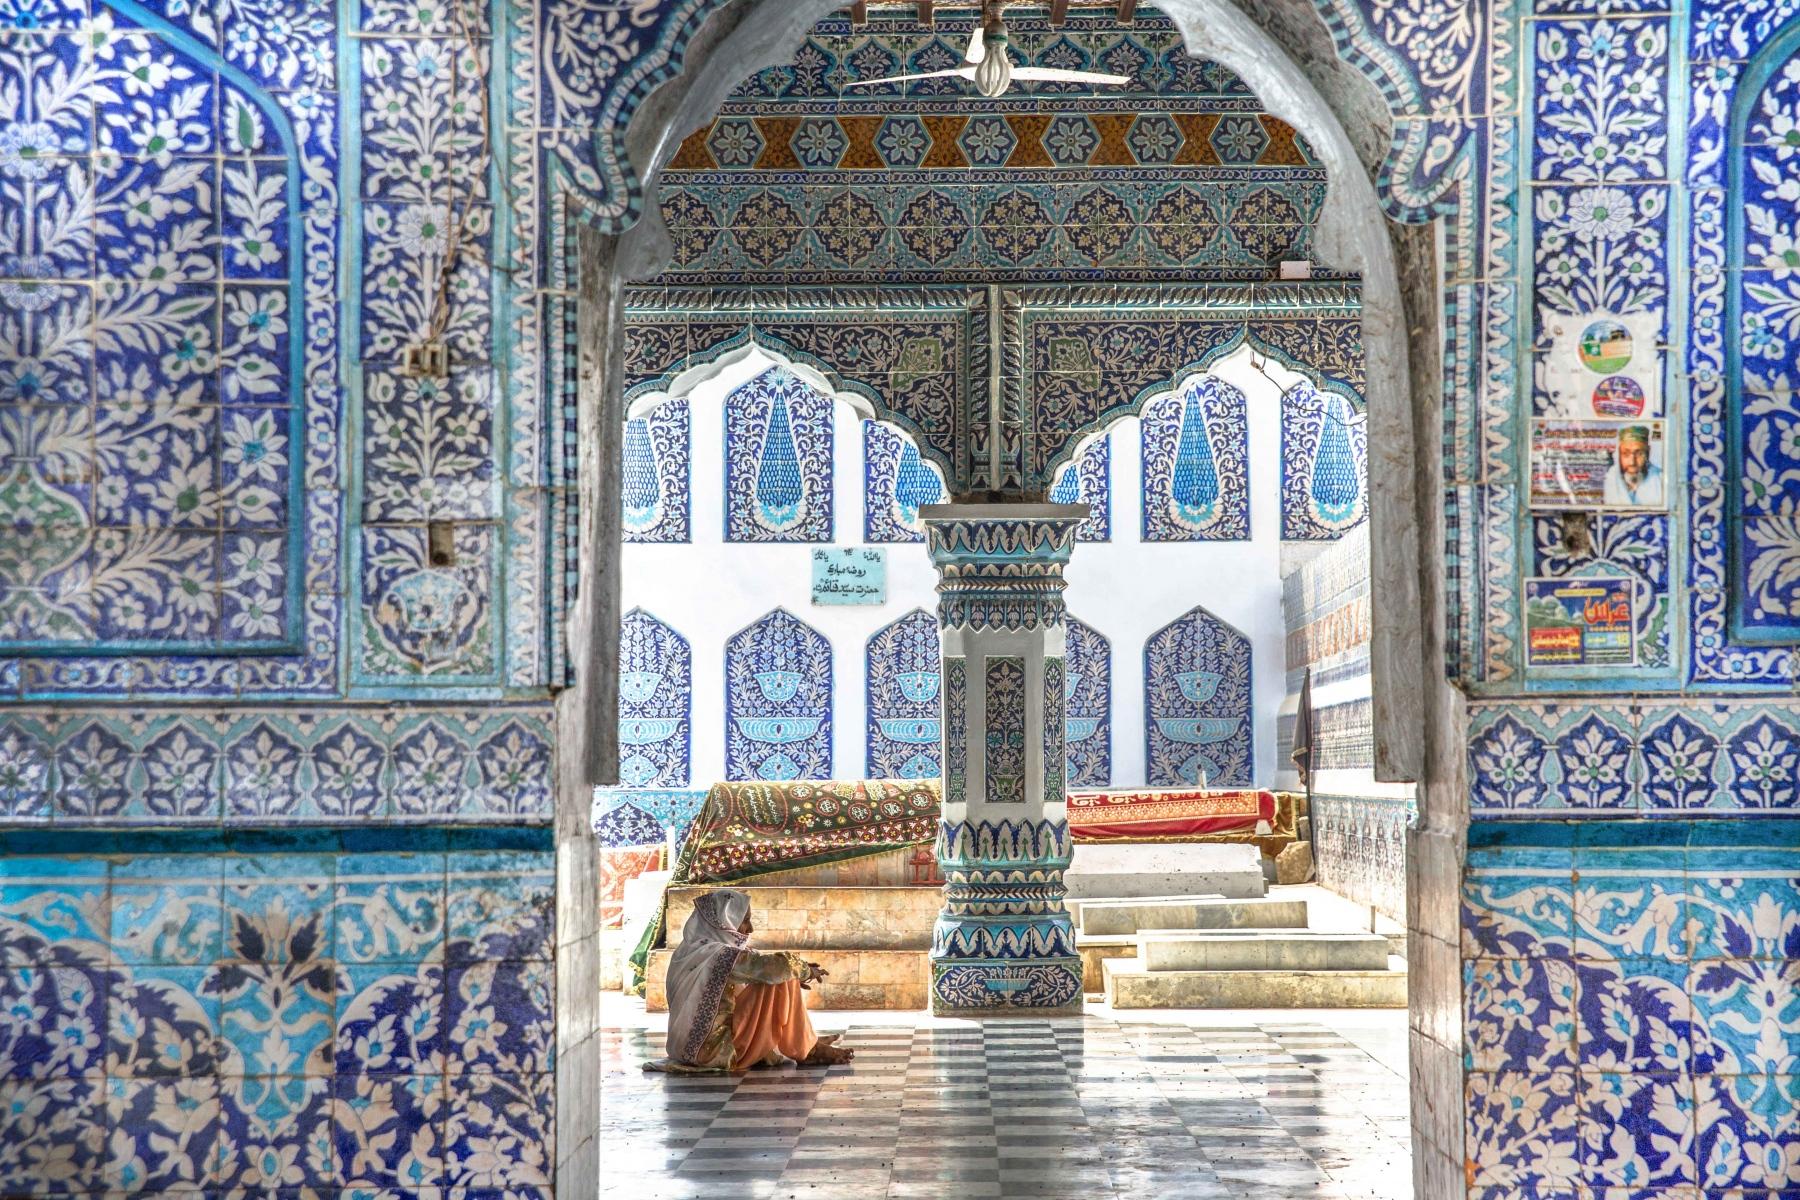 tomb of Abdul Shah Latif in Bhit Shah